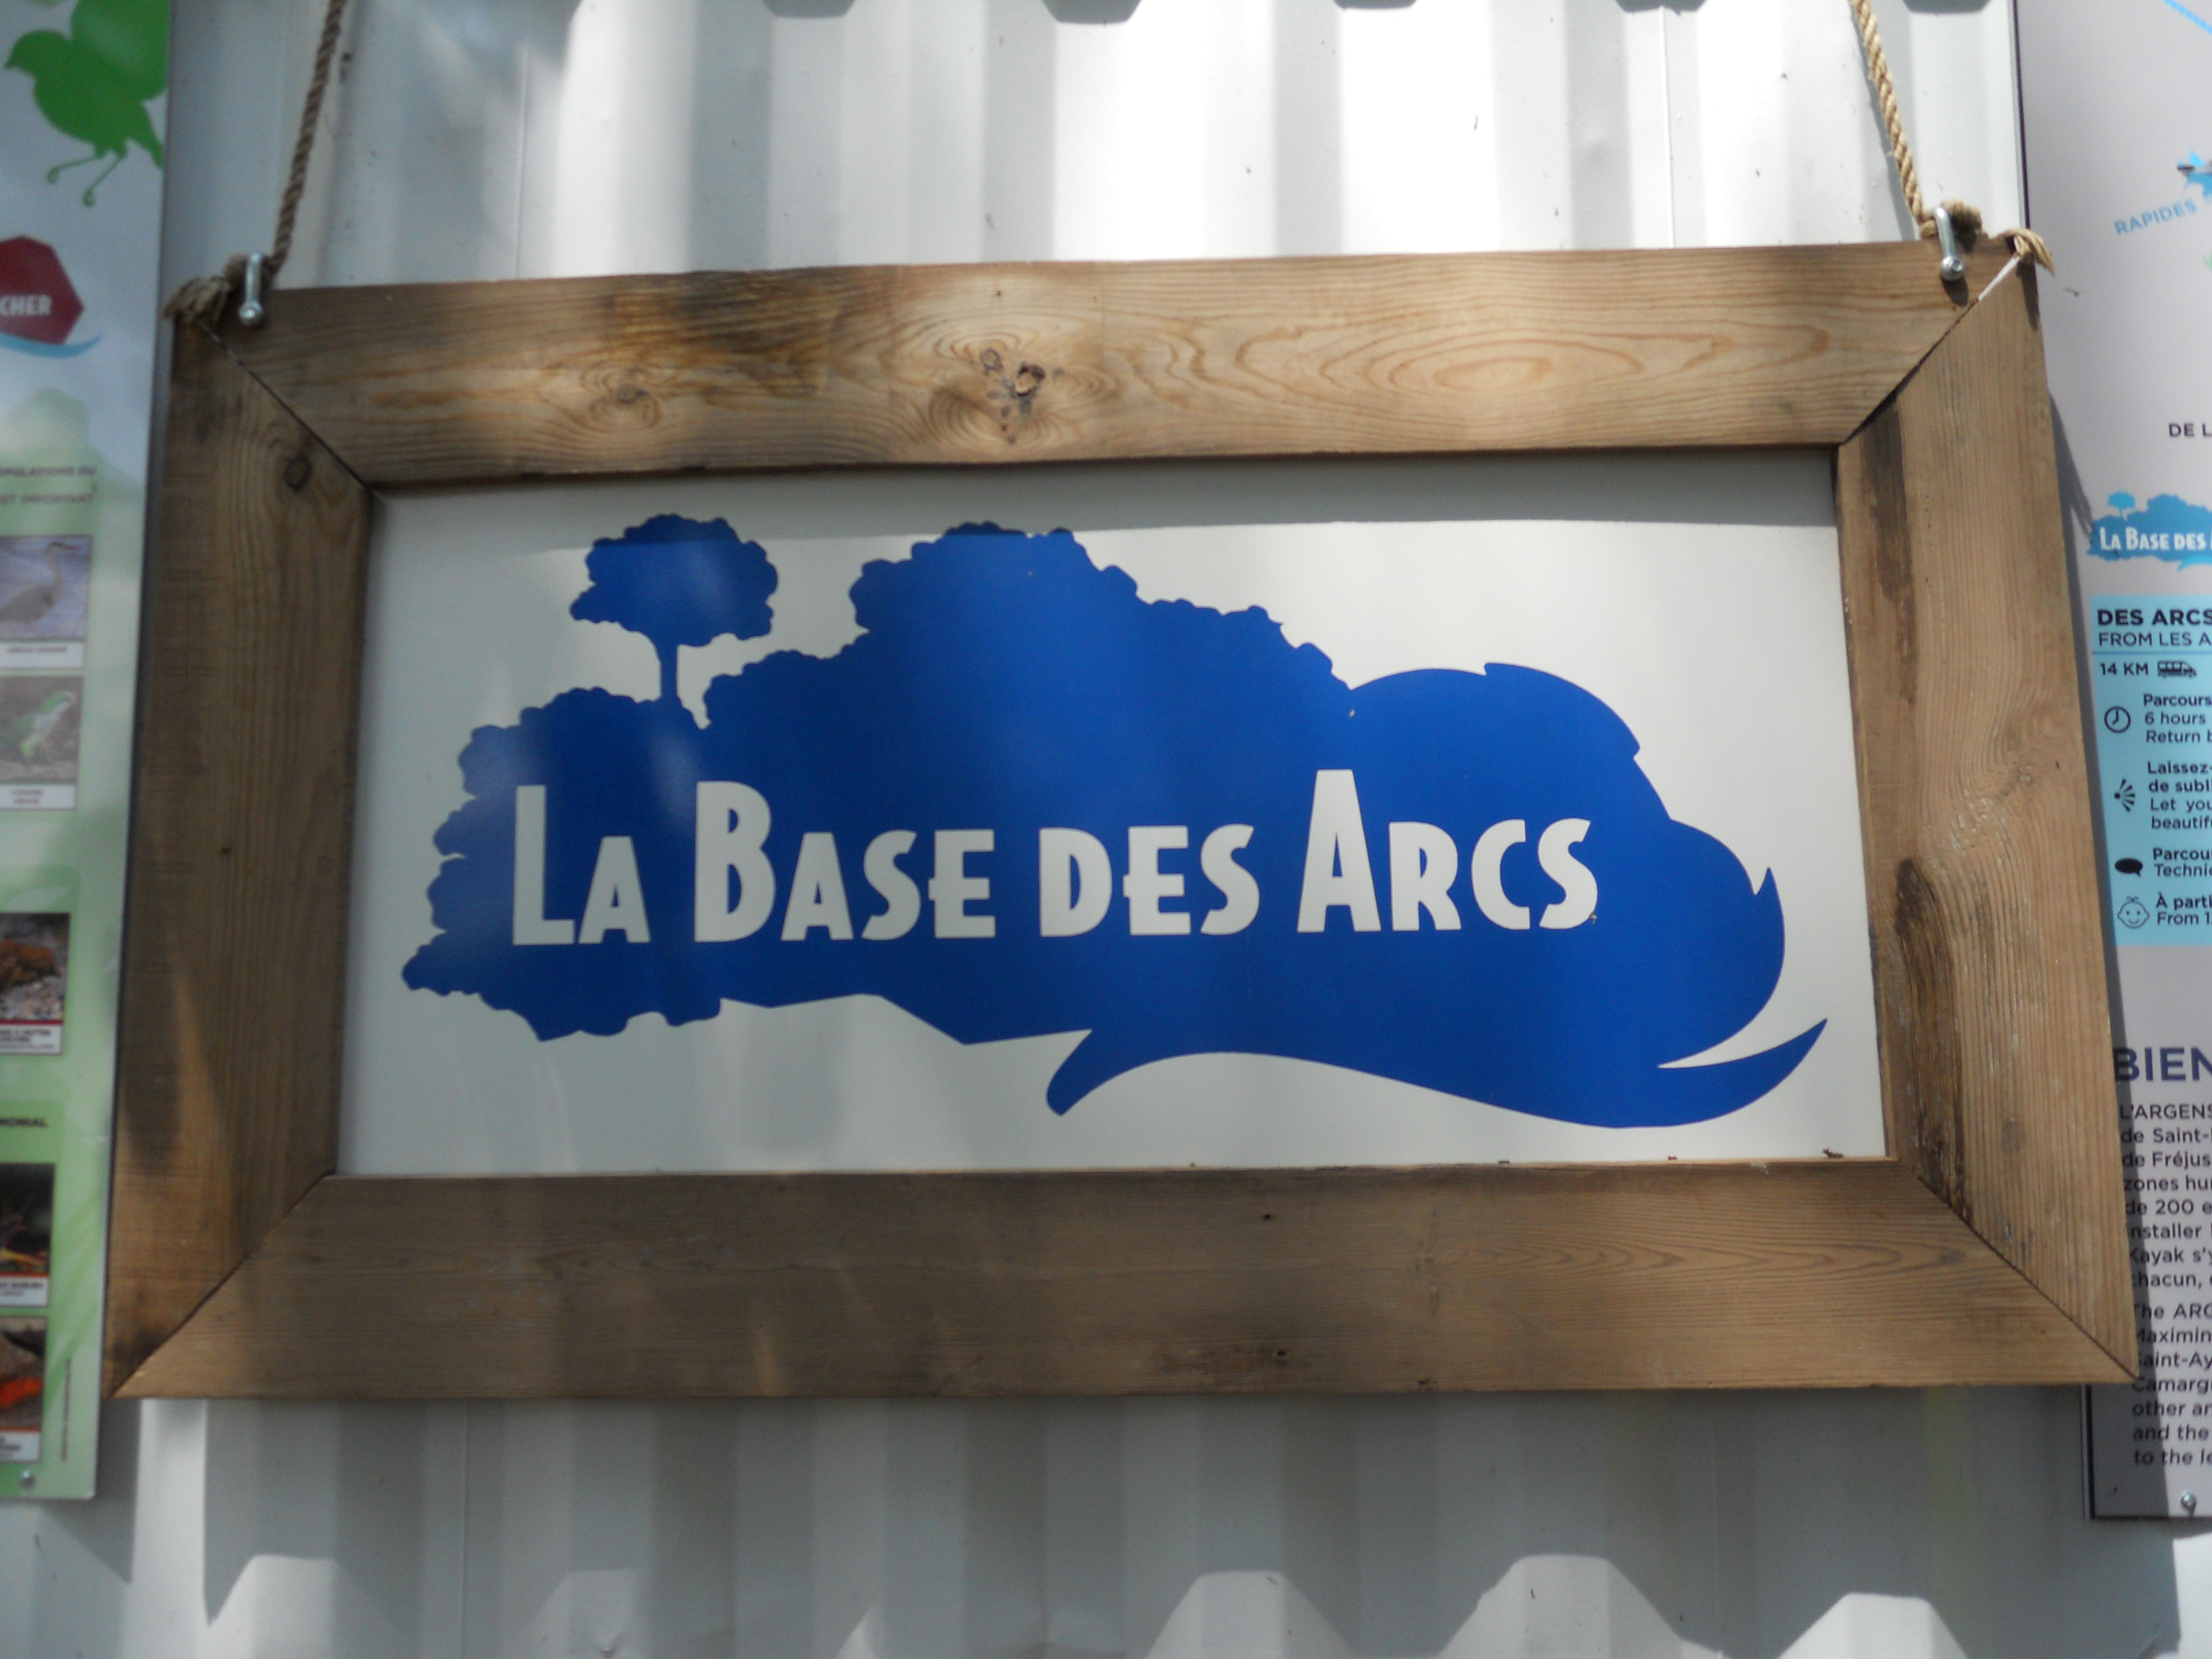 La Base des Arcs